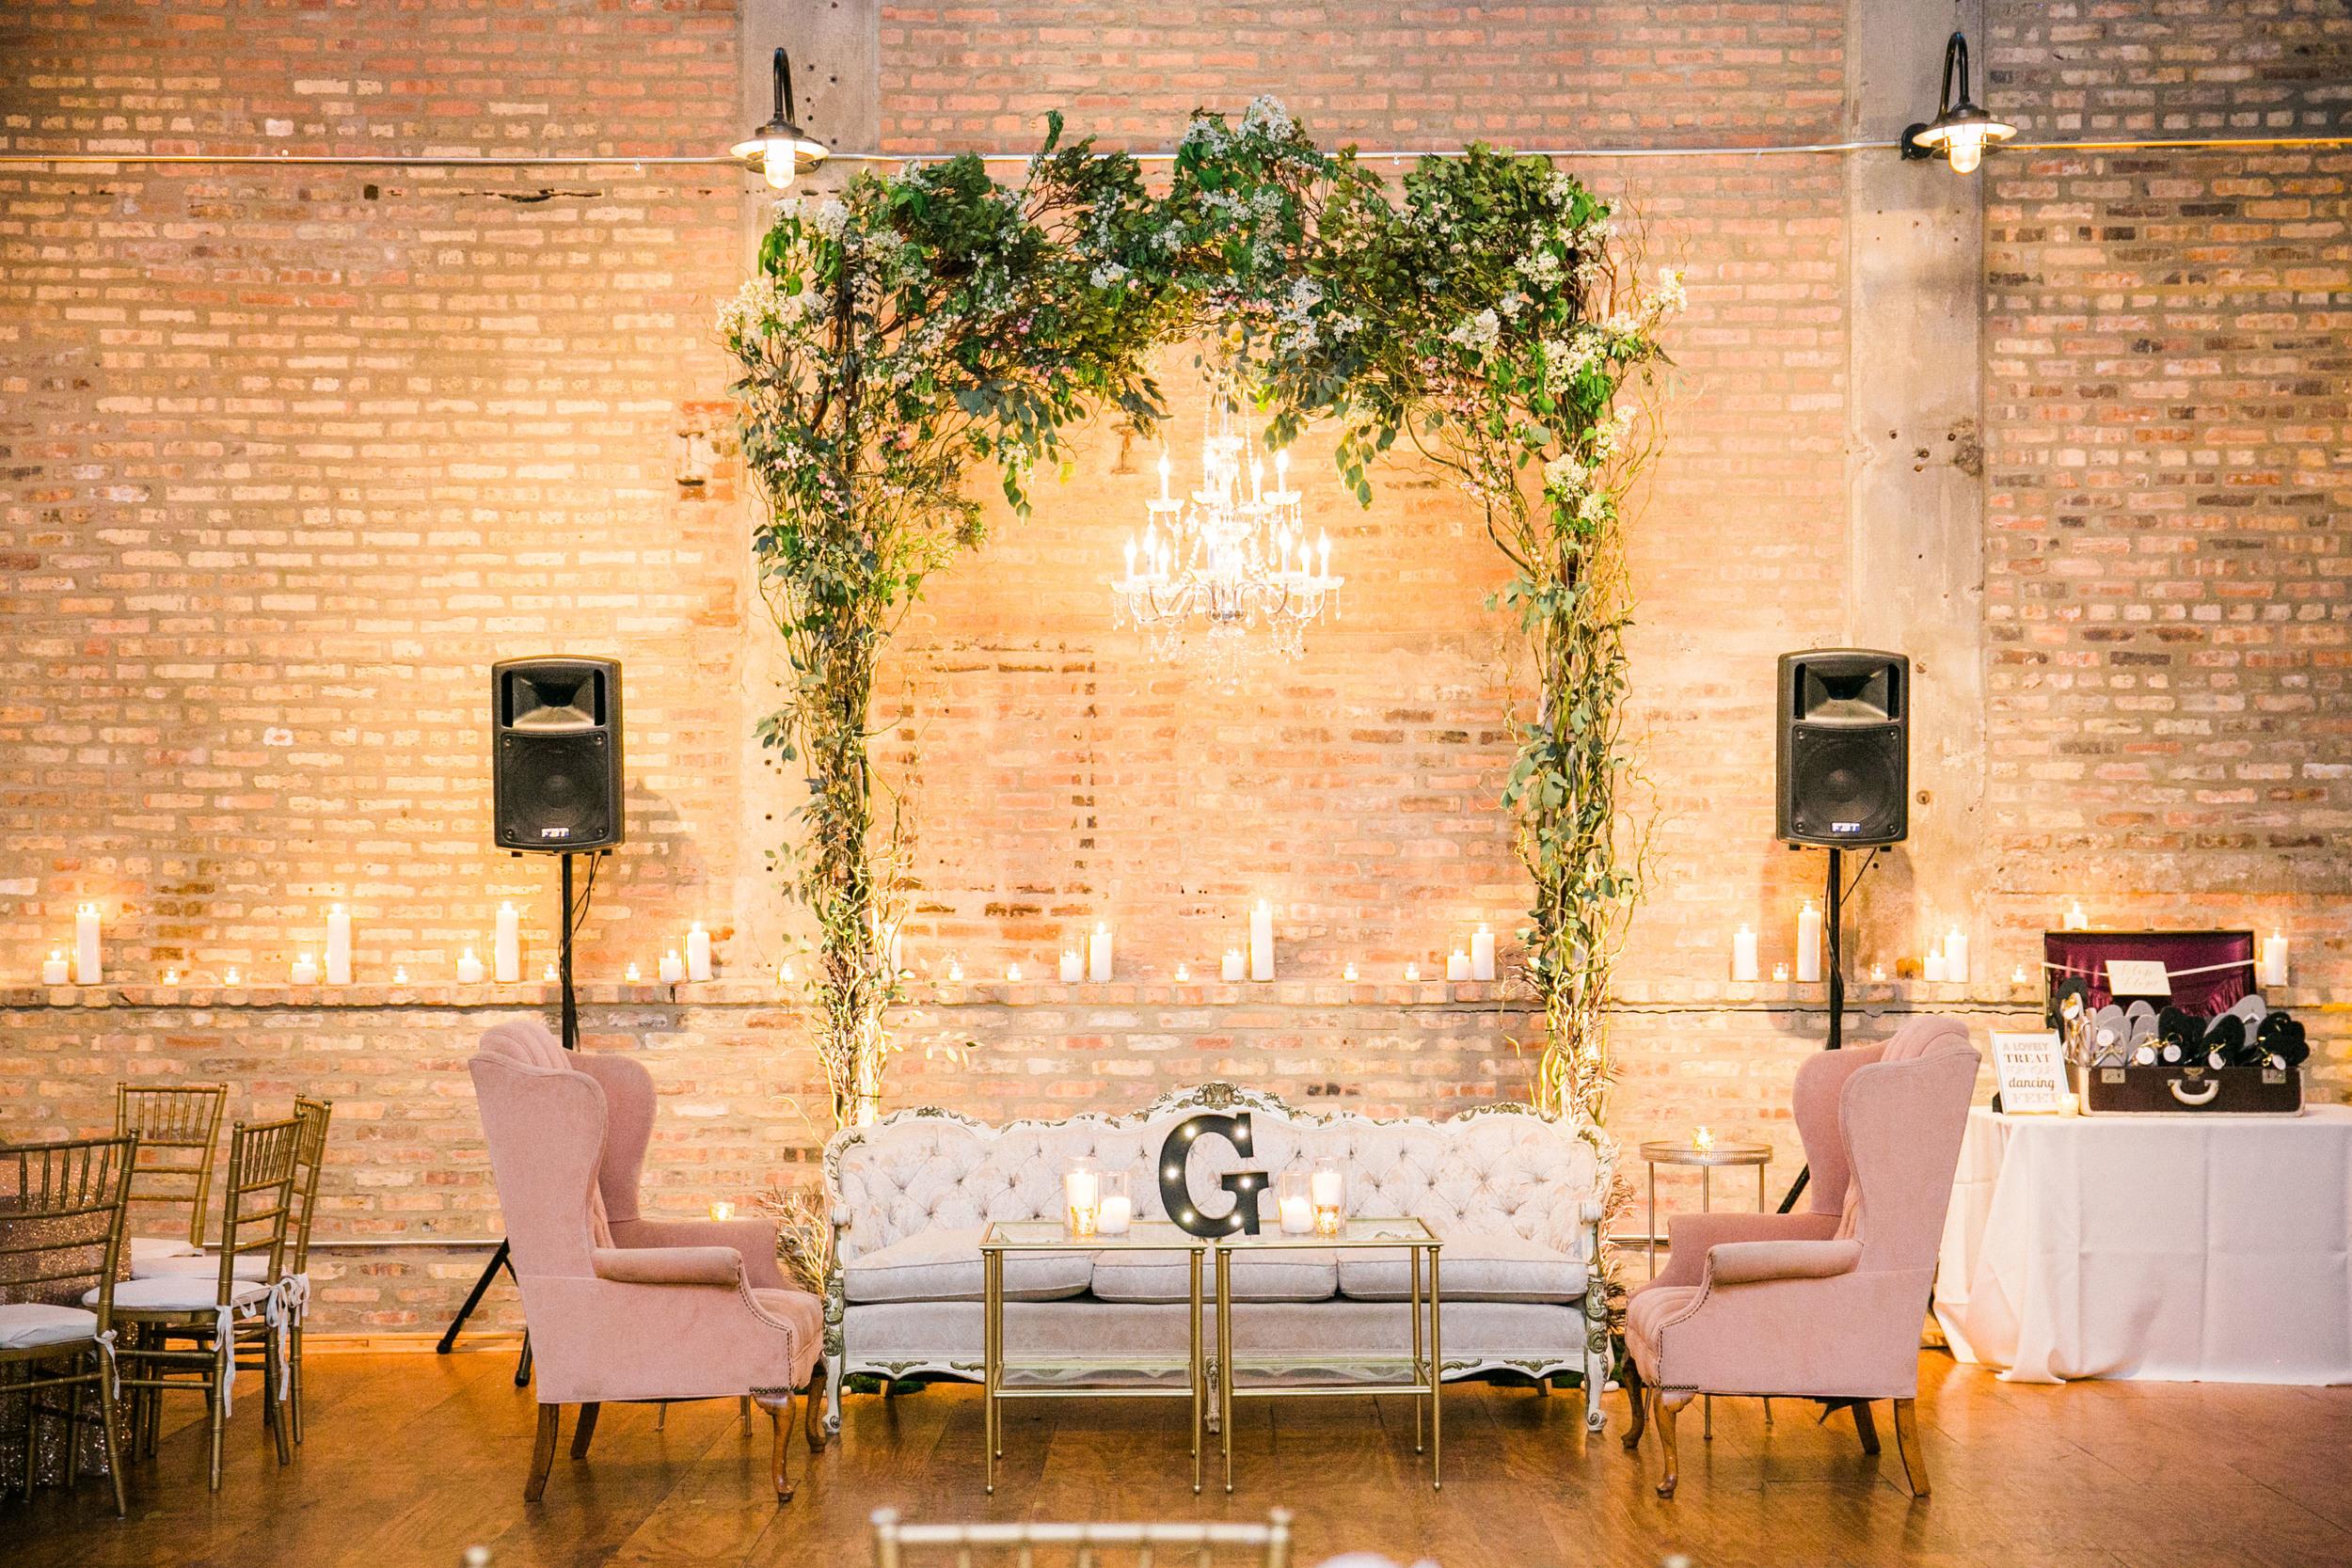 mayden_photography_weddings-131.jpg